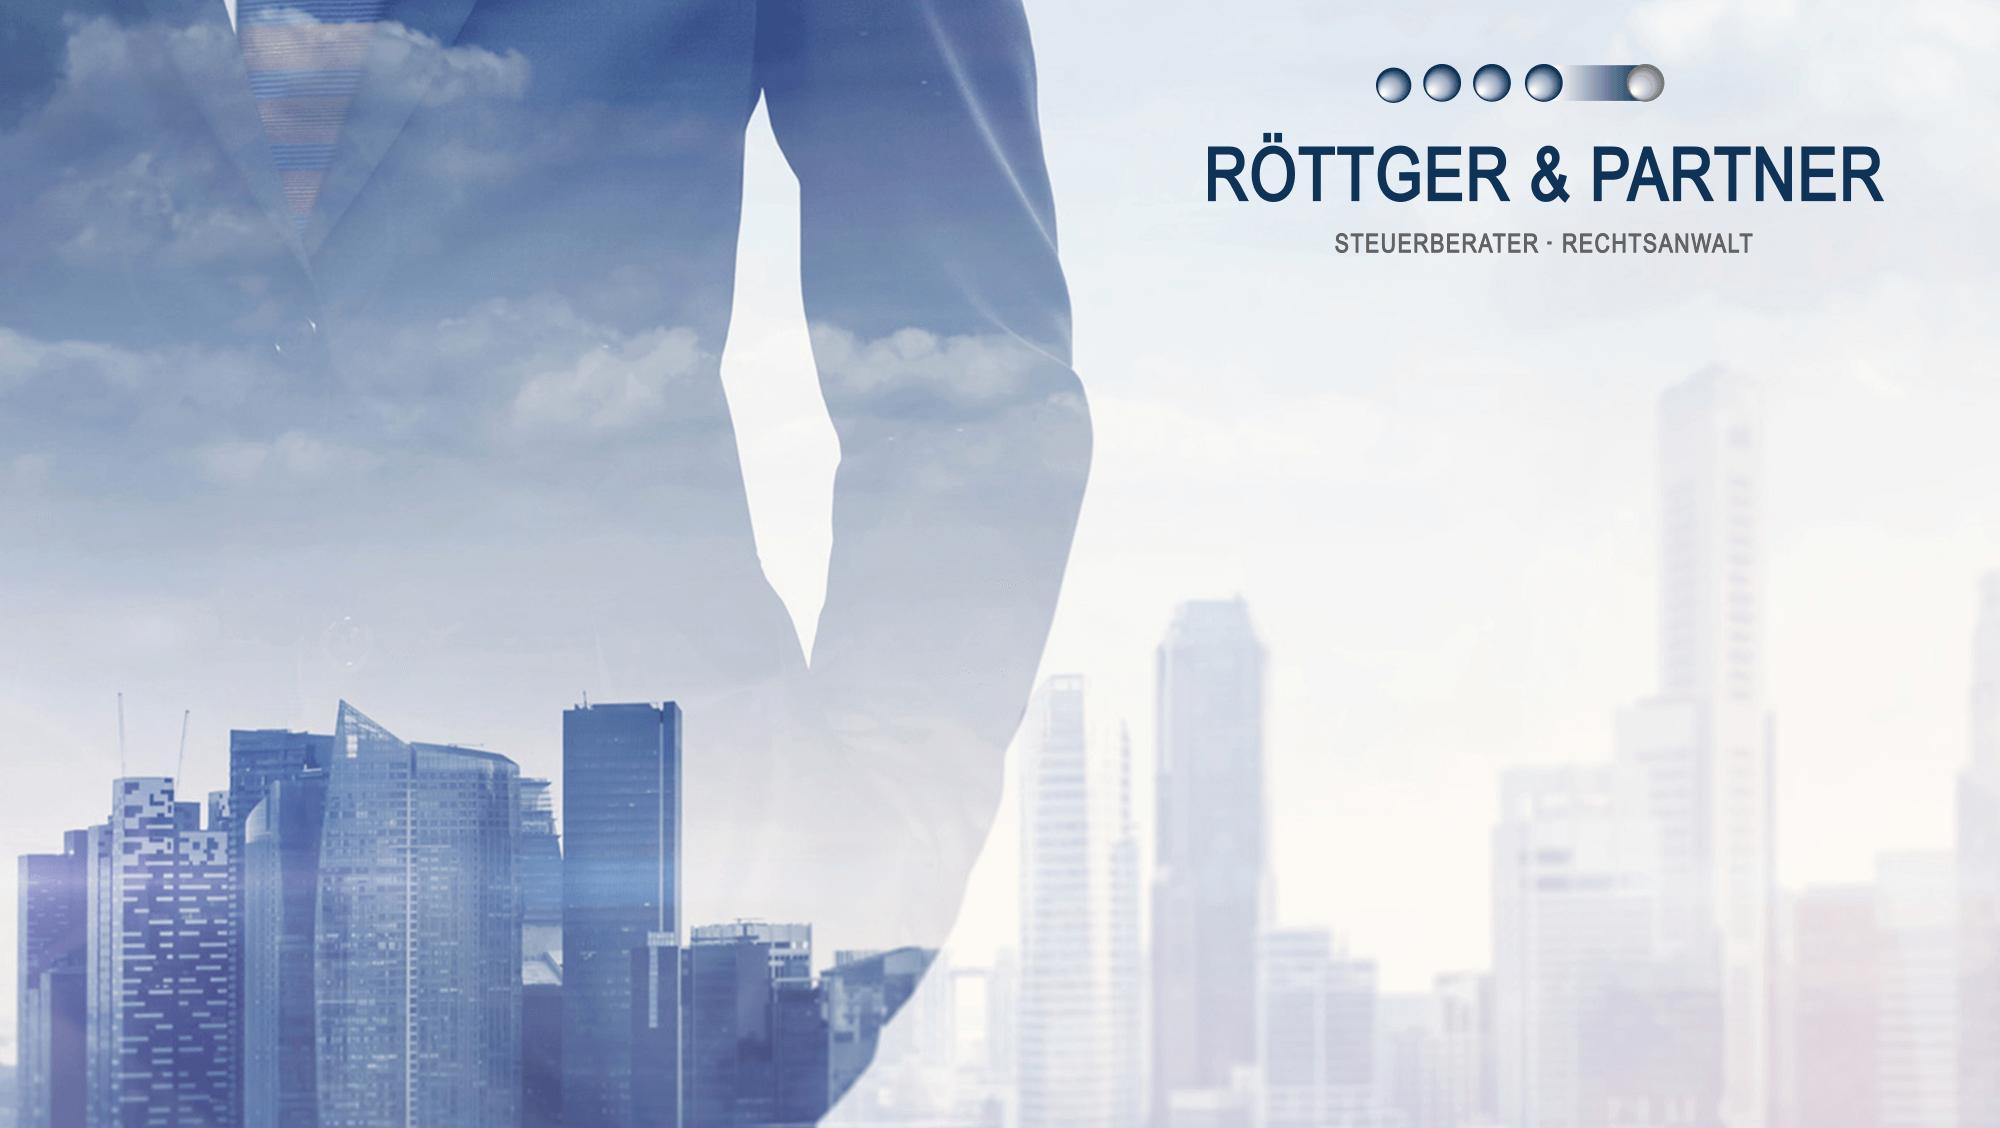 Rottger & Partner-BrandCrock-portfolio-heaader img